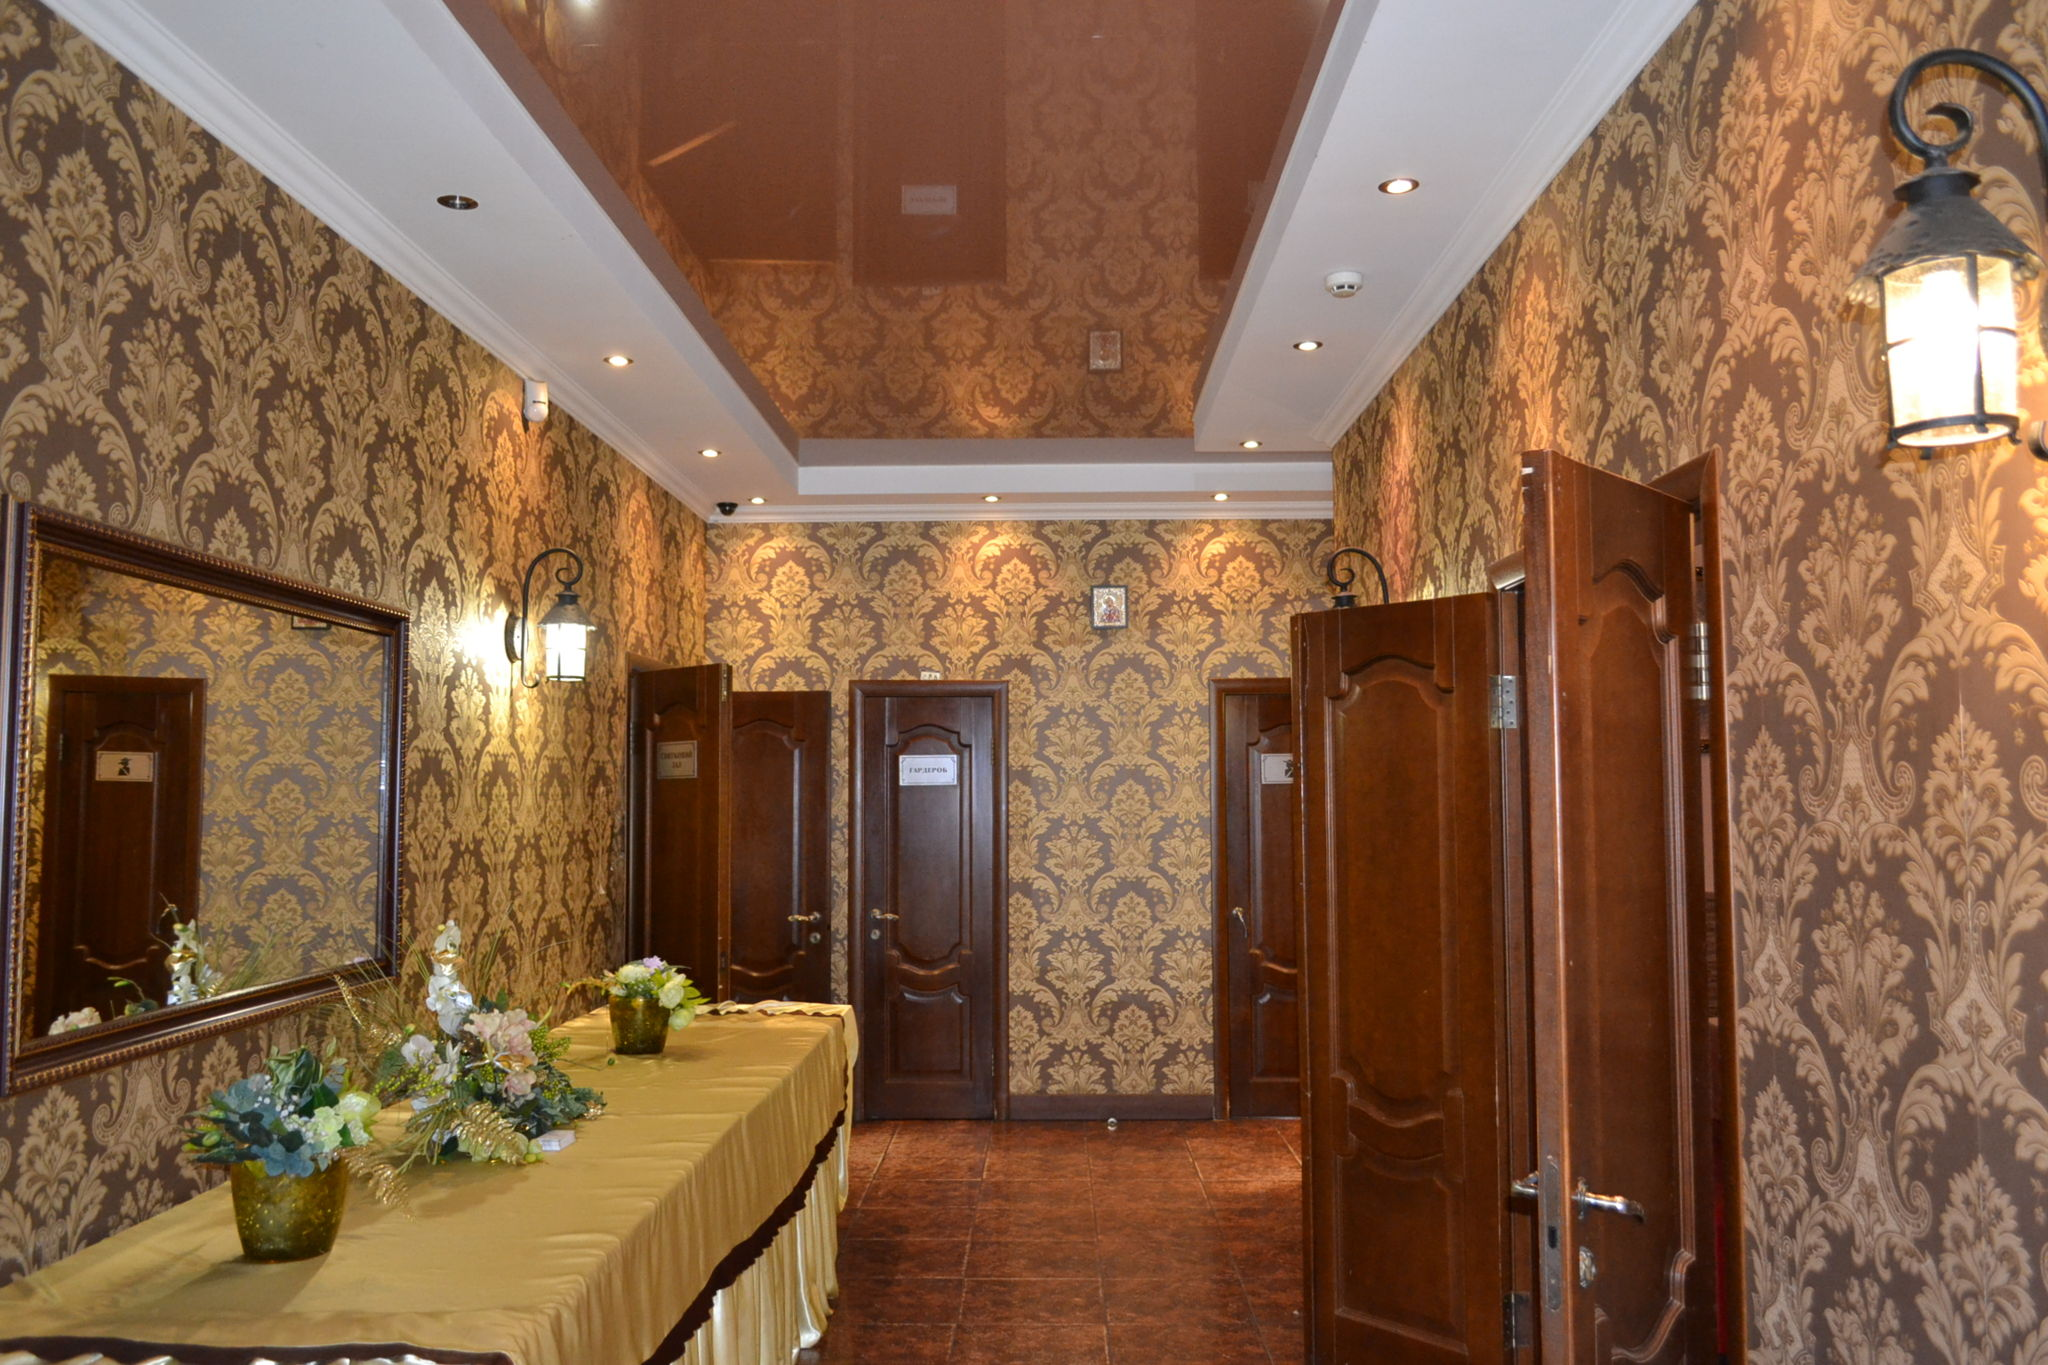 Ресторан, W-5563321, Чаадаева Петра, 2, Киев - Фото 7